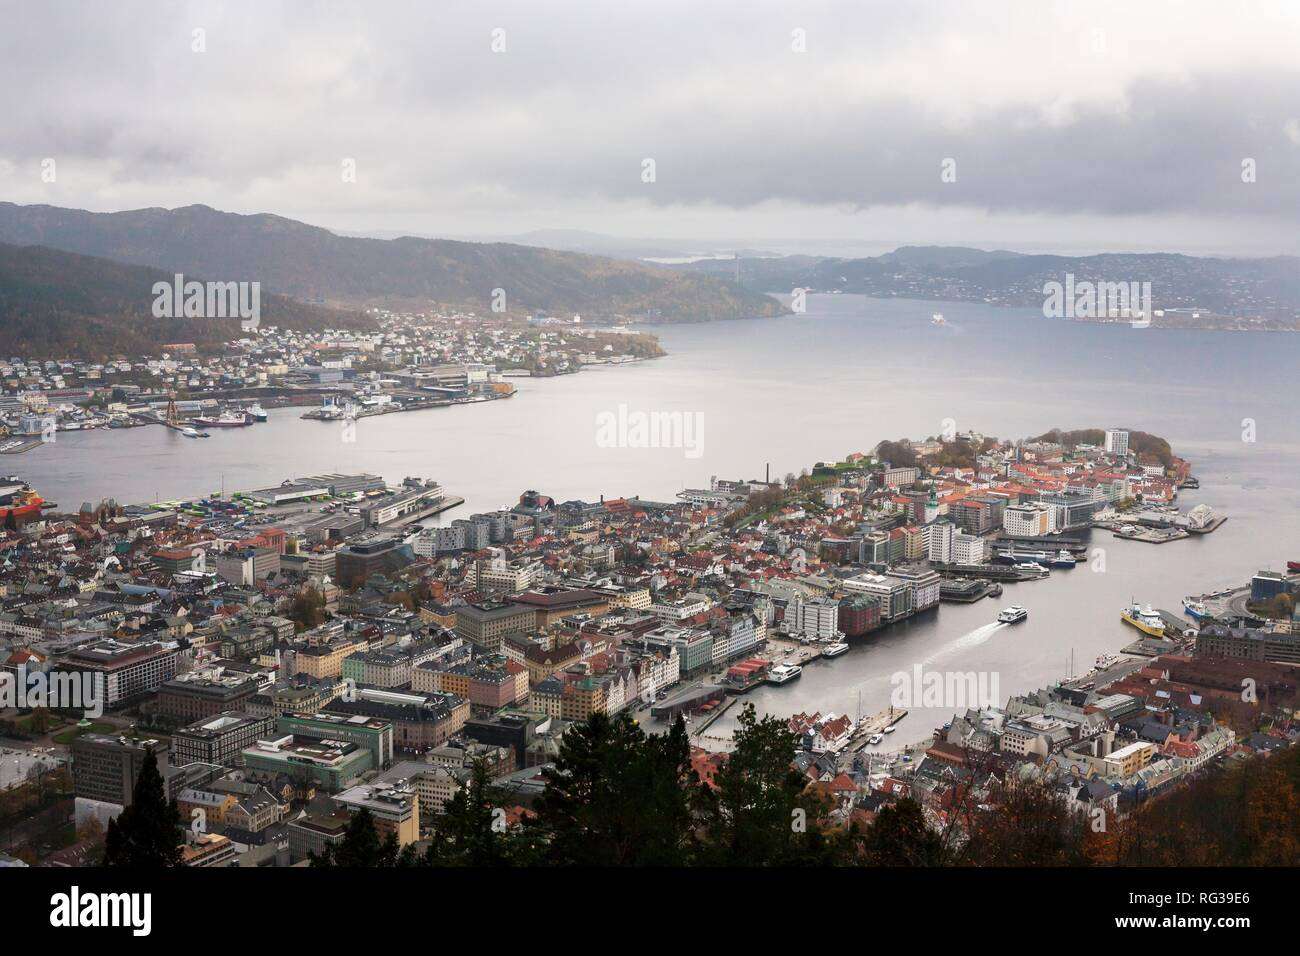 View over Bergen, Norway, from Mount Fløyen - Stock Image